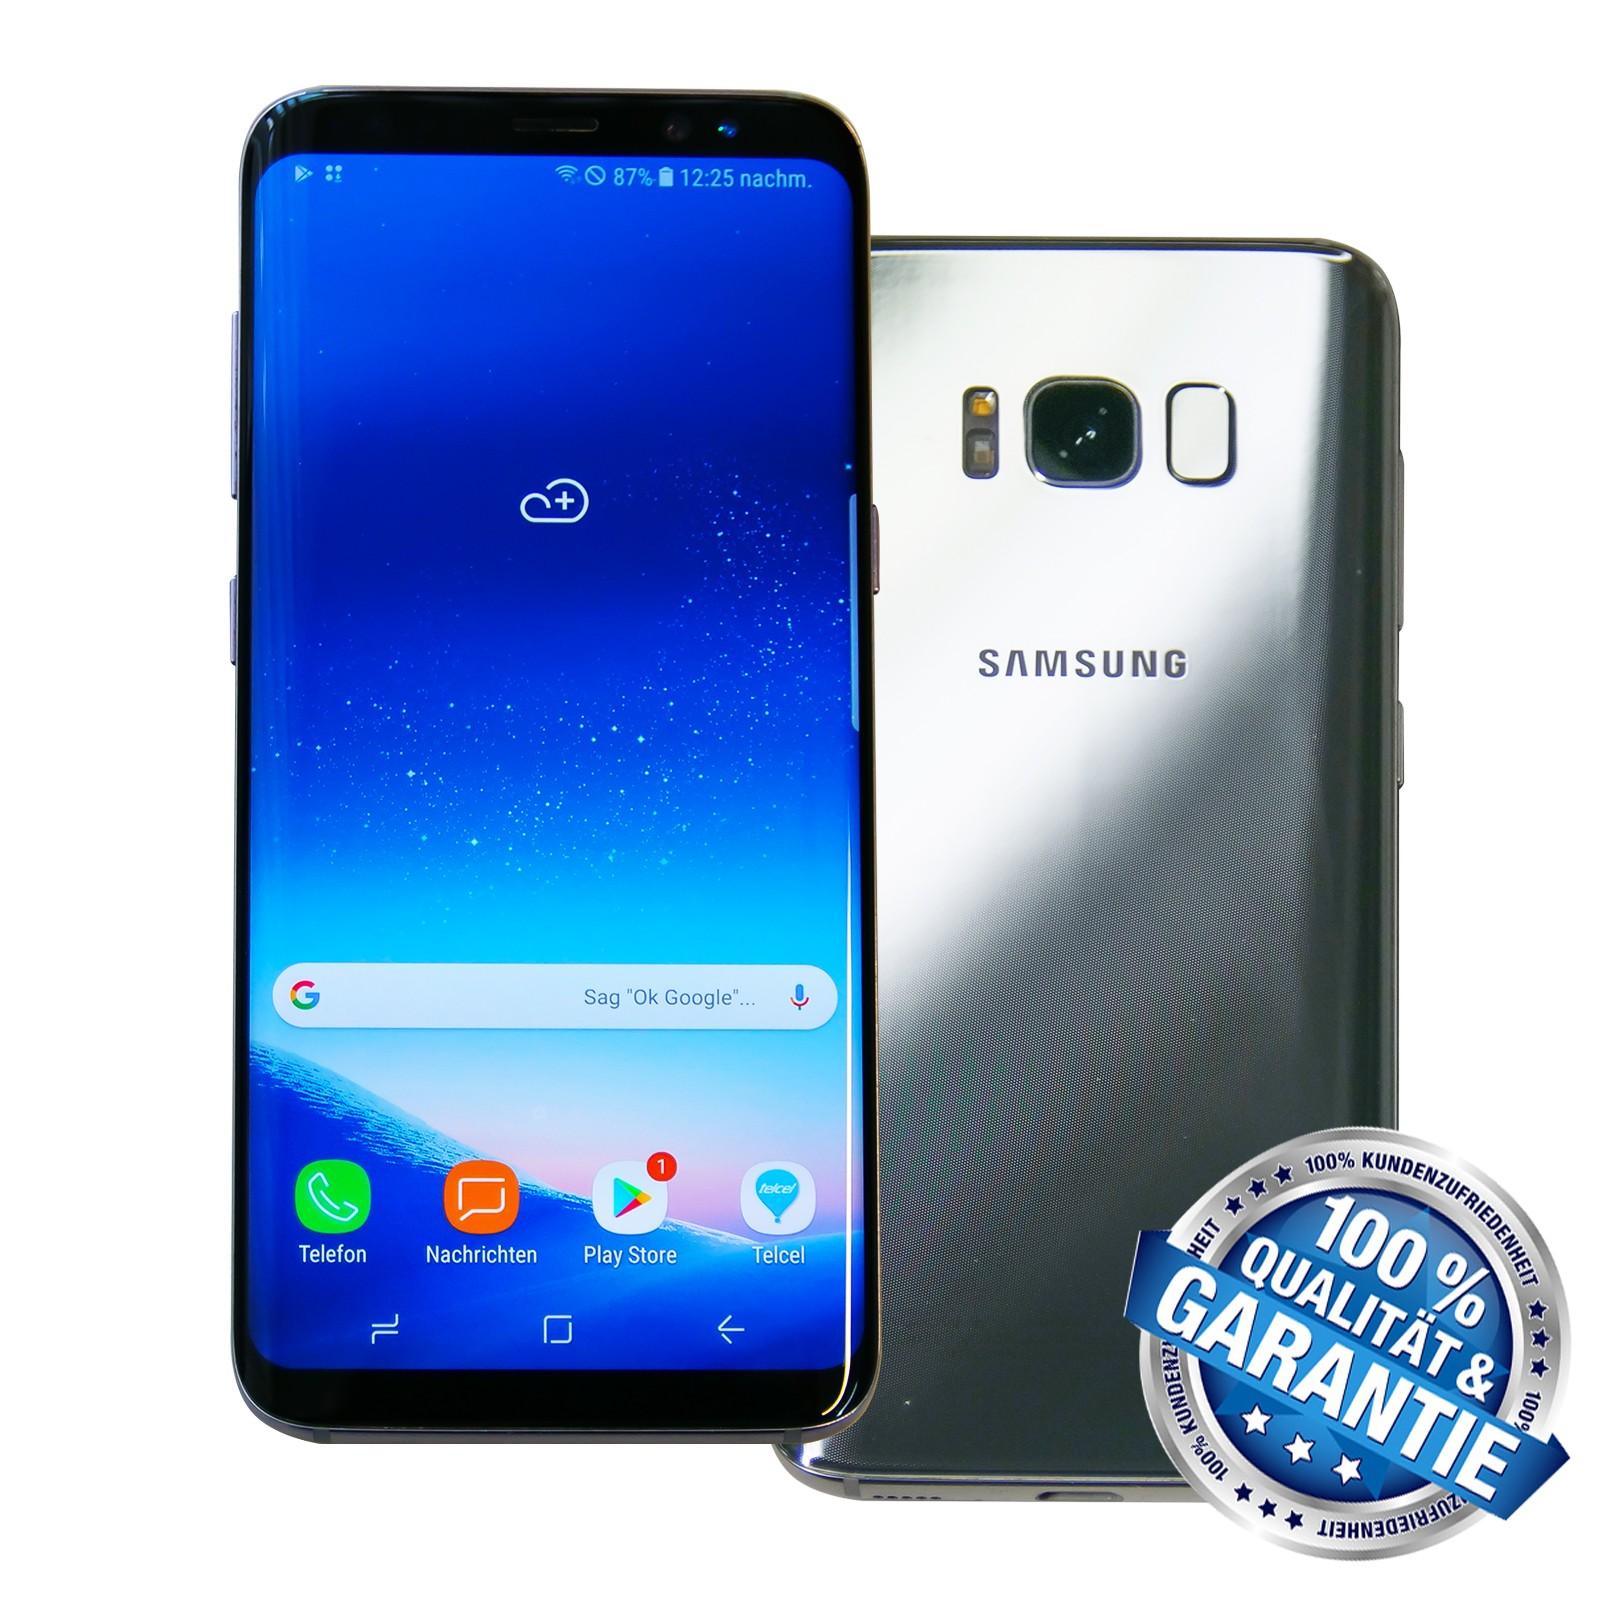 Samsung Galaxy S8 Gebraucht 64gb Ohne Vertrag Eu Computer Alexander Geier Walter Stoll Gbr